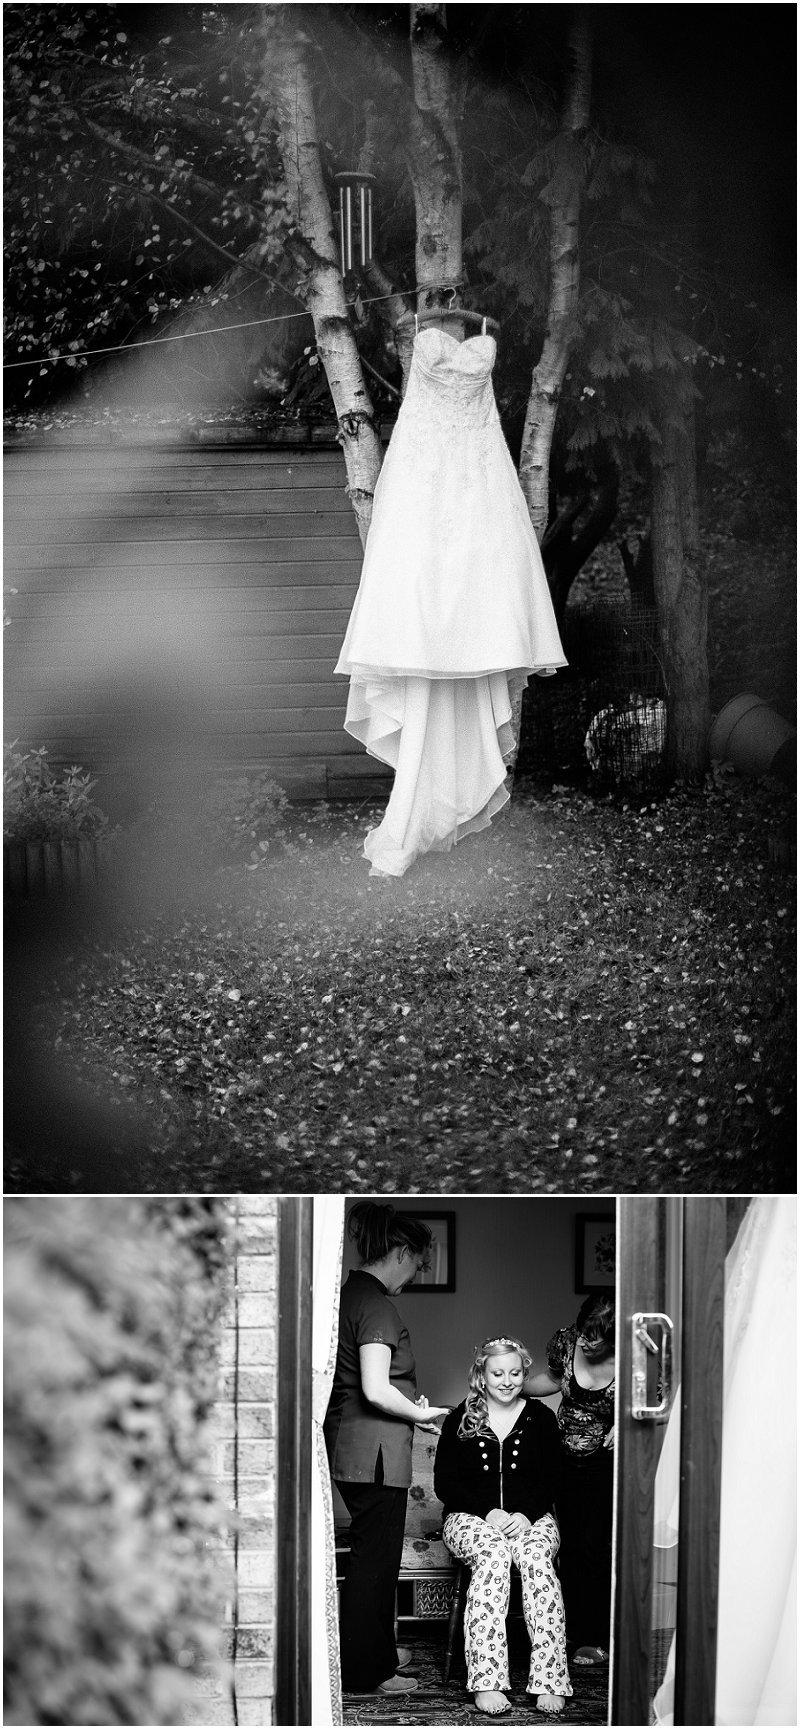 Sefton Park Wedding Photography Liverpool | Award Winning Wedding photographer